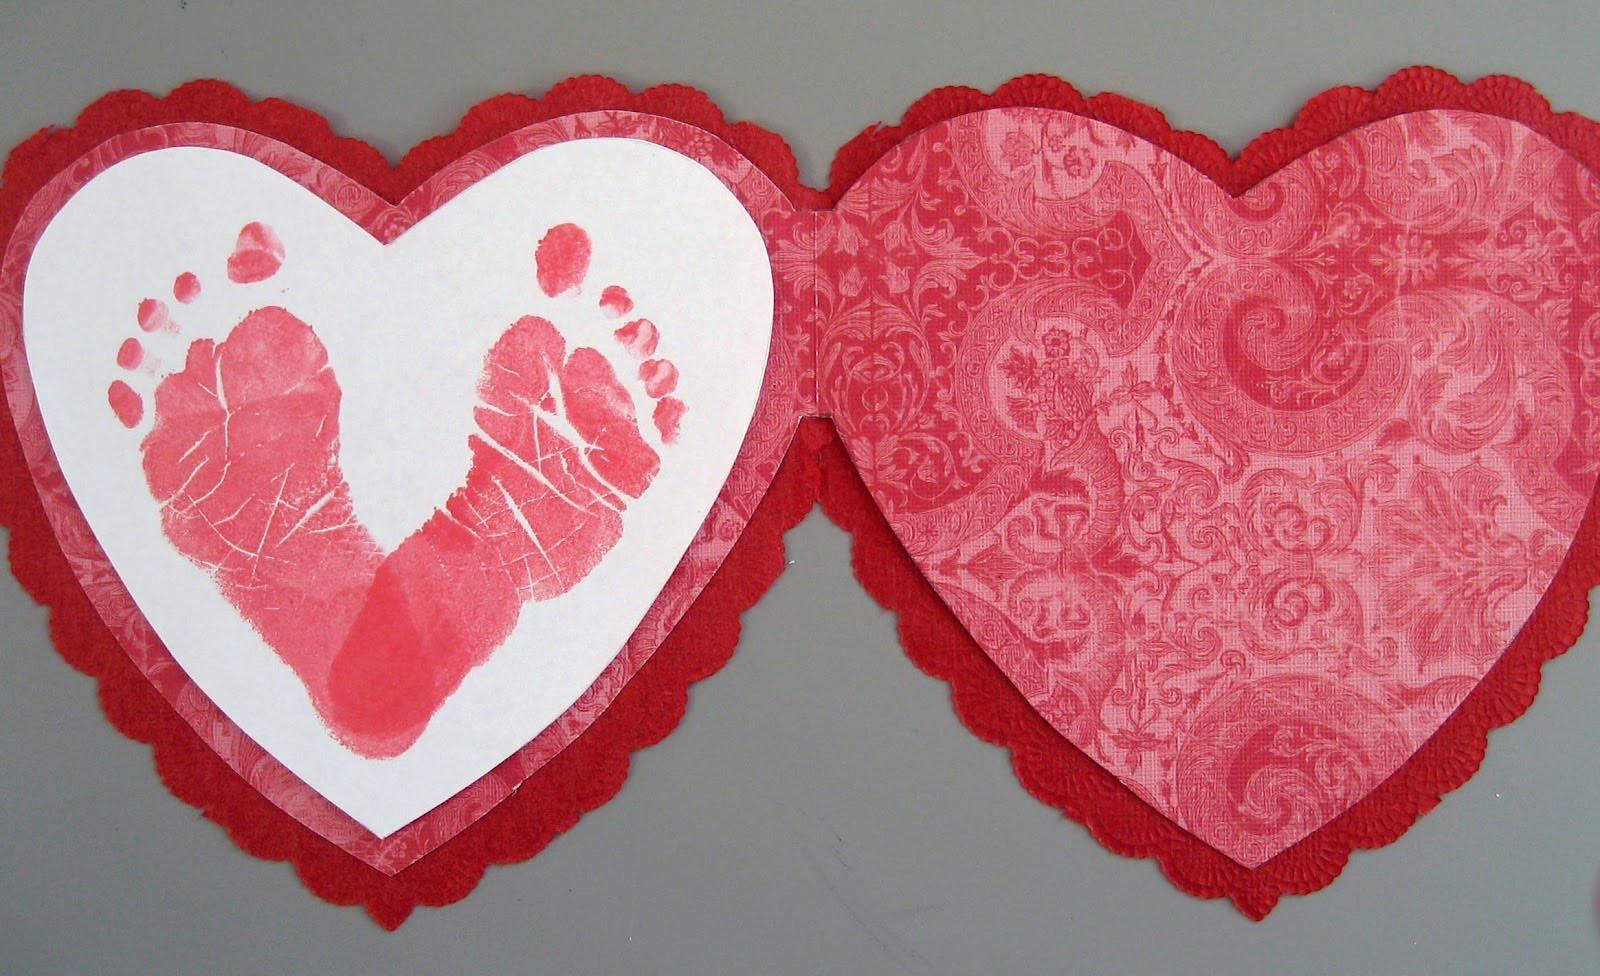 Infant Valentines Day Crafts Crafts For Children Pinterest